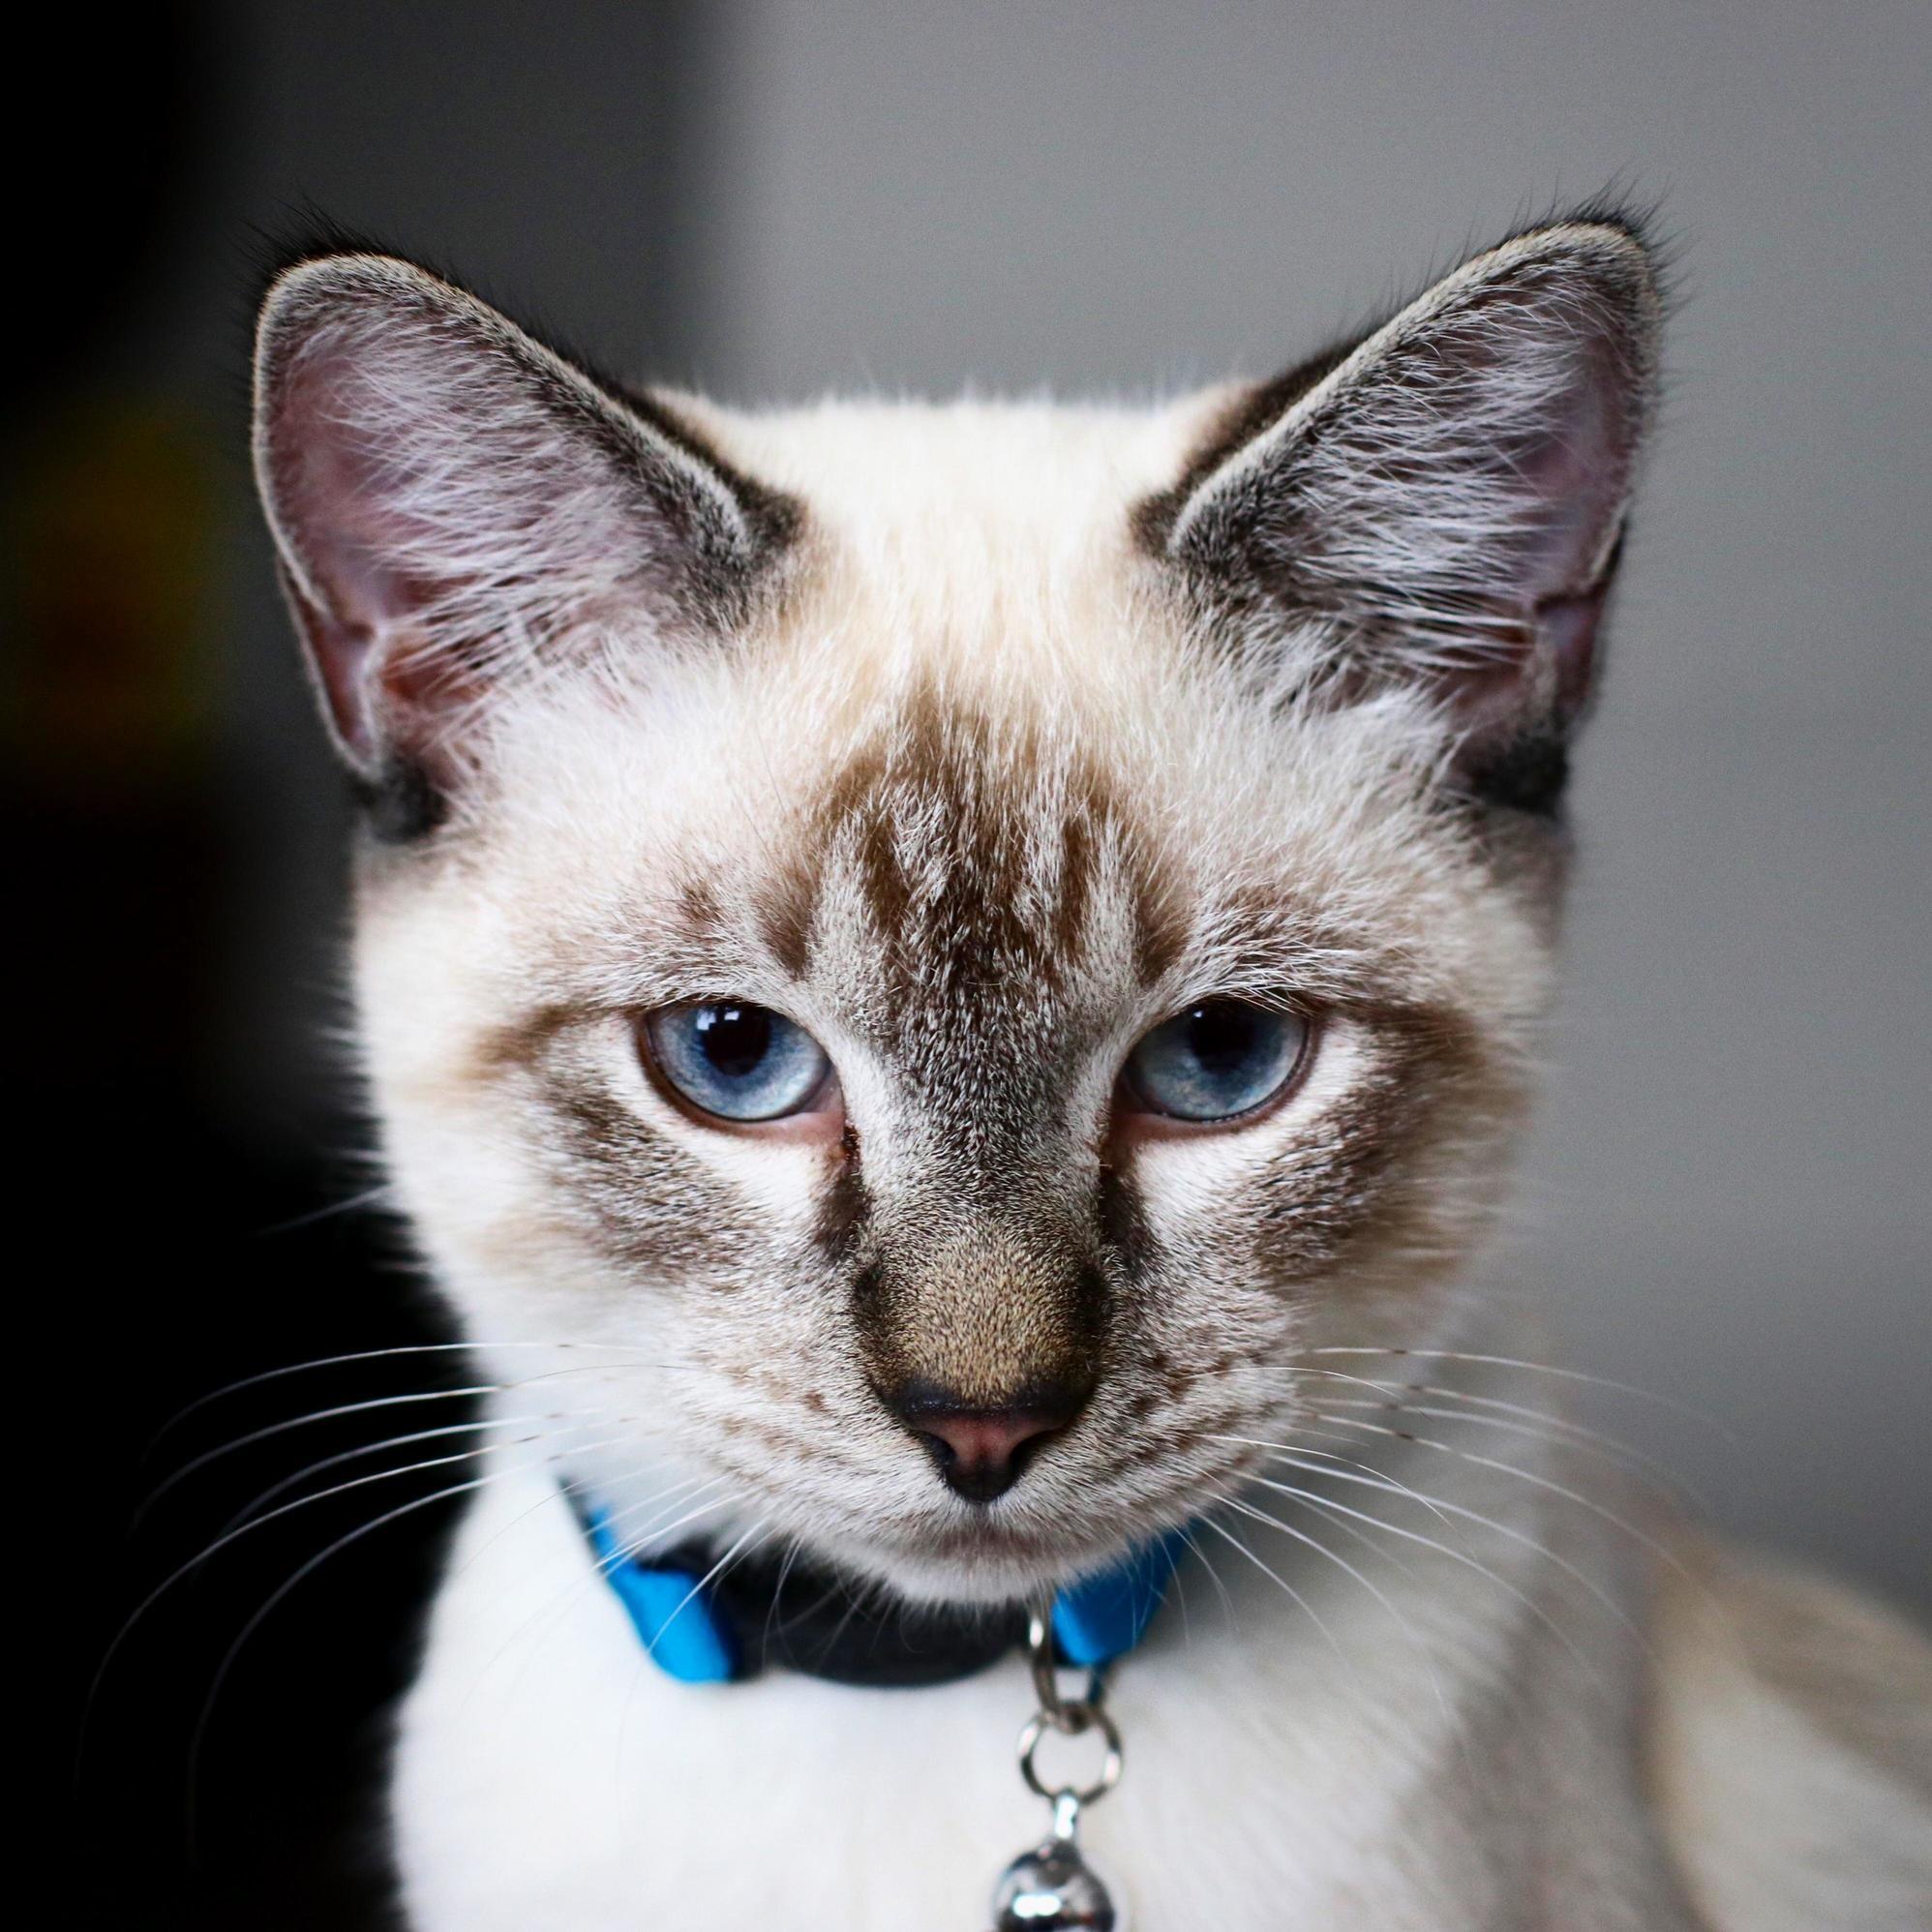 My cat is a linkedin premium member.